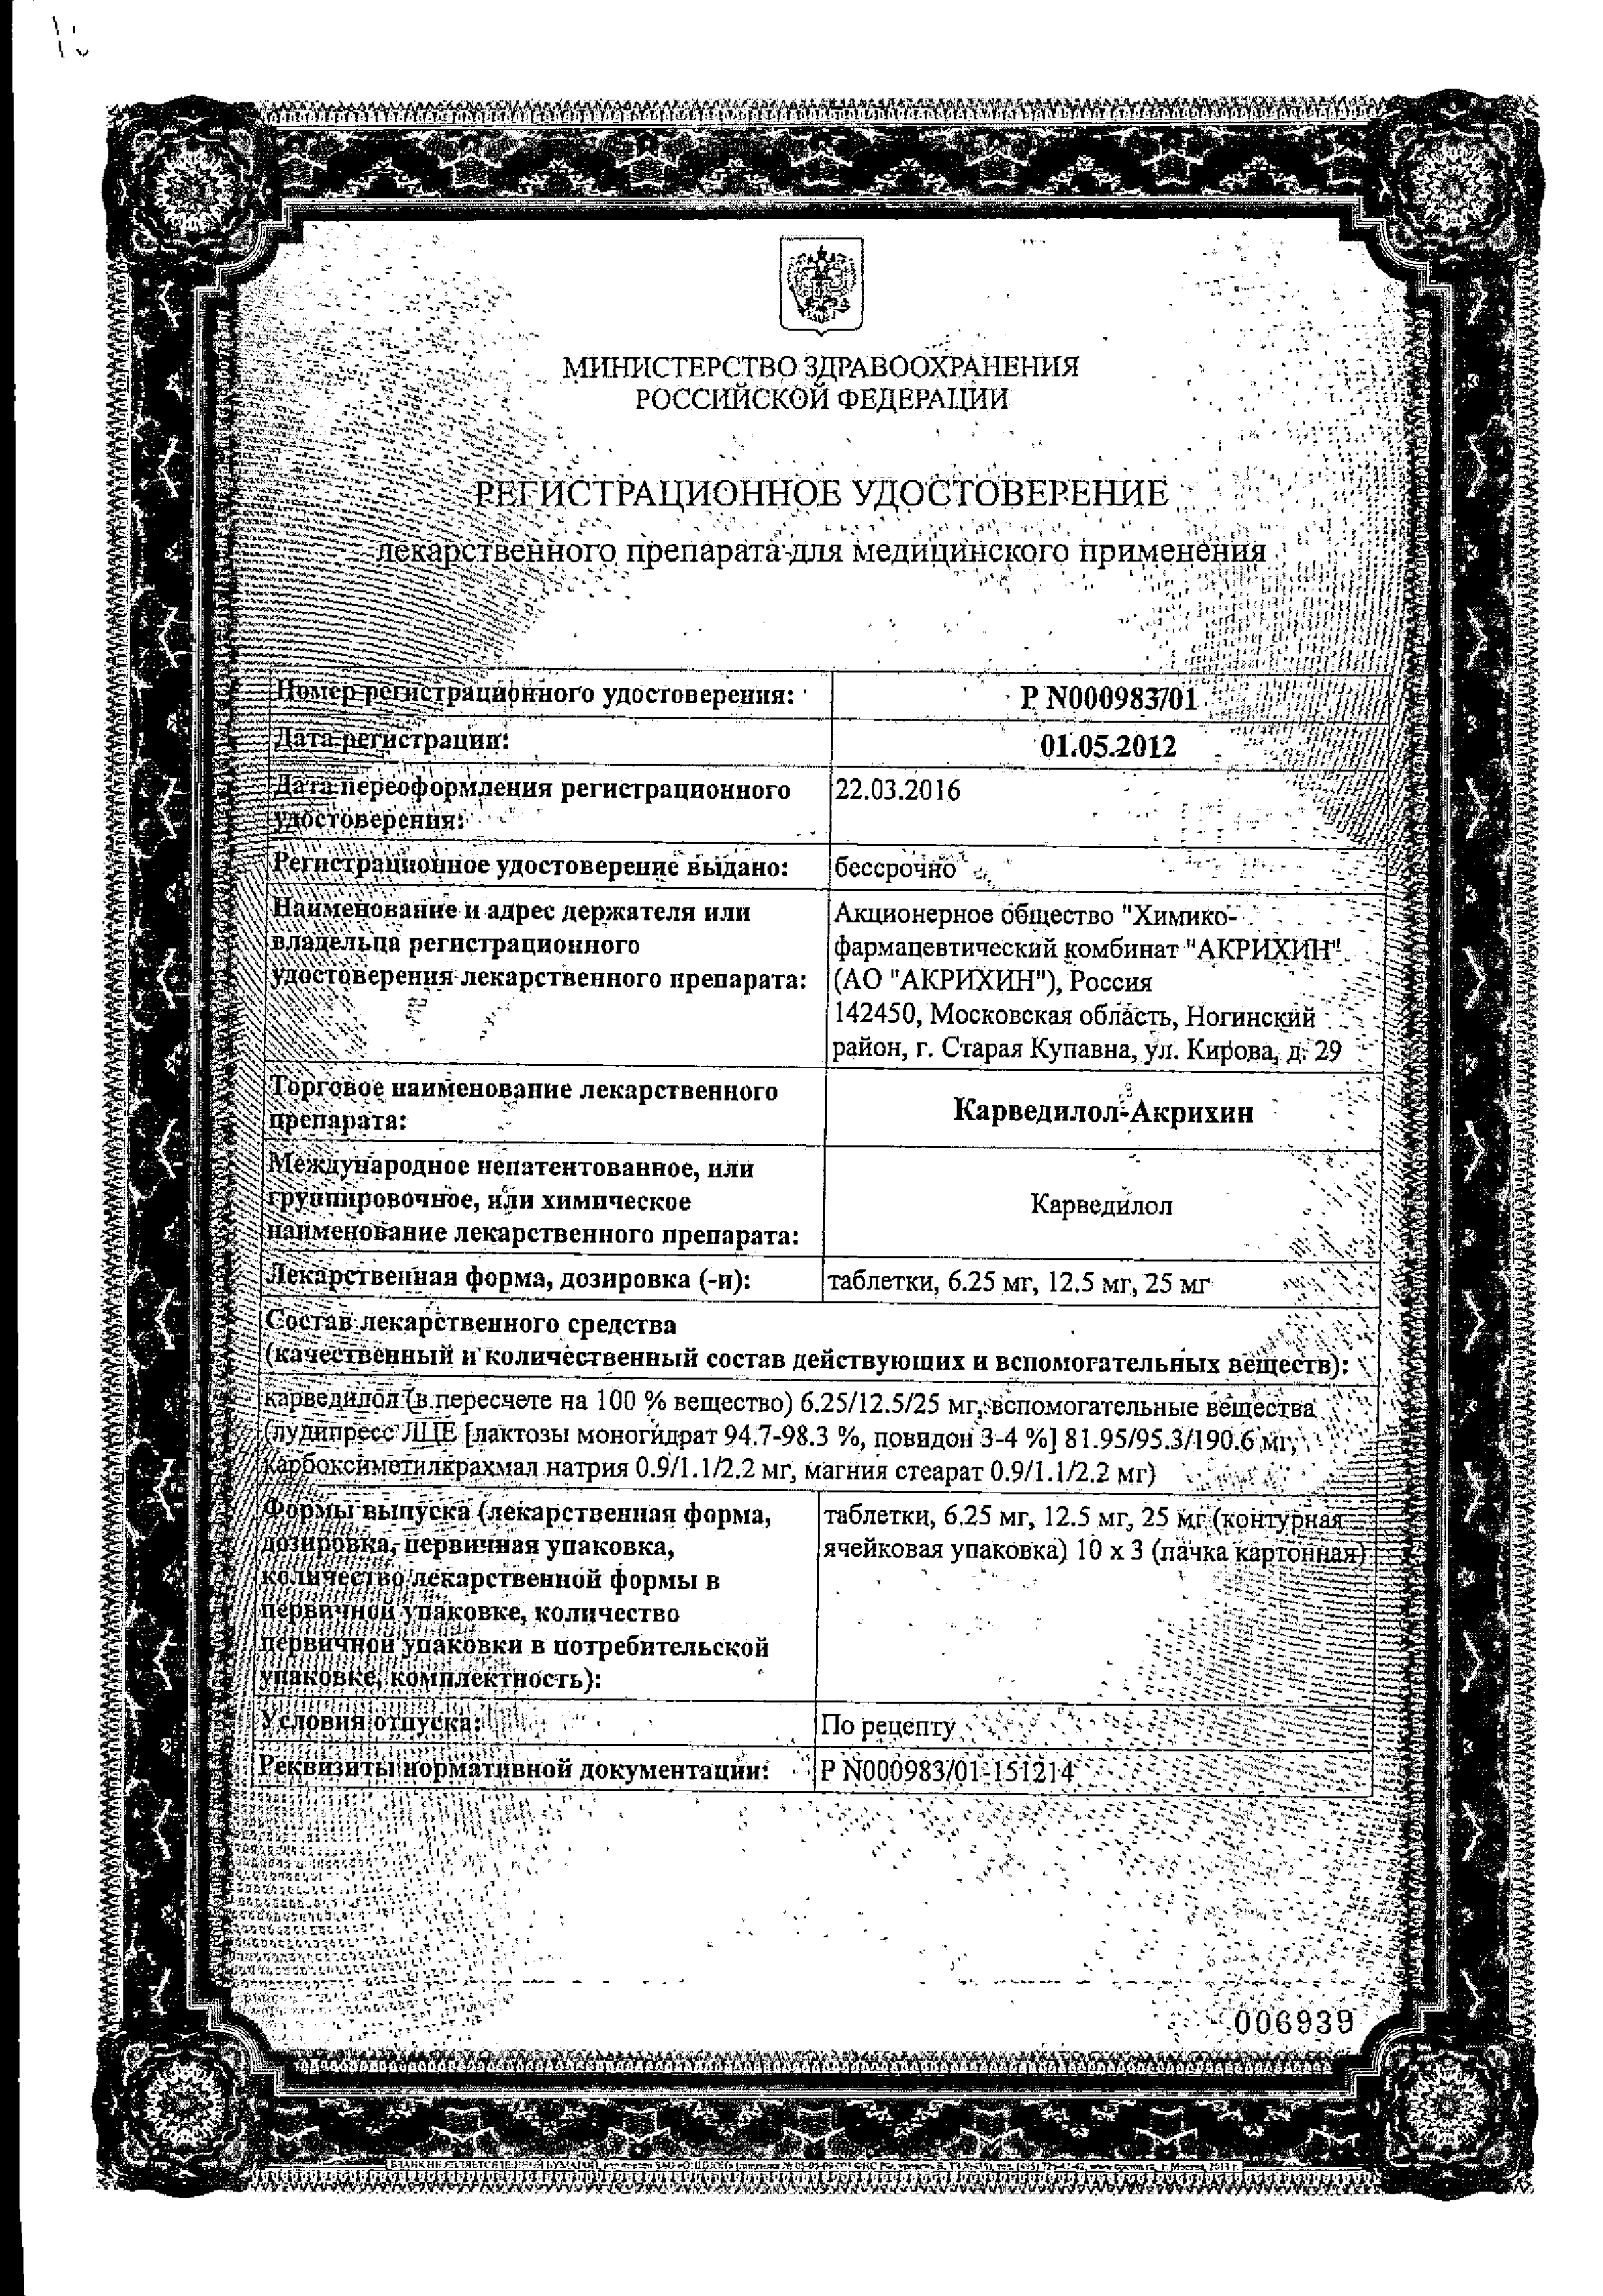 Карведилол-Акрихин сертификат